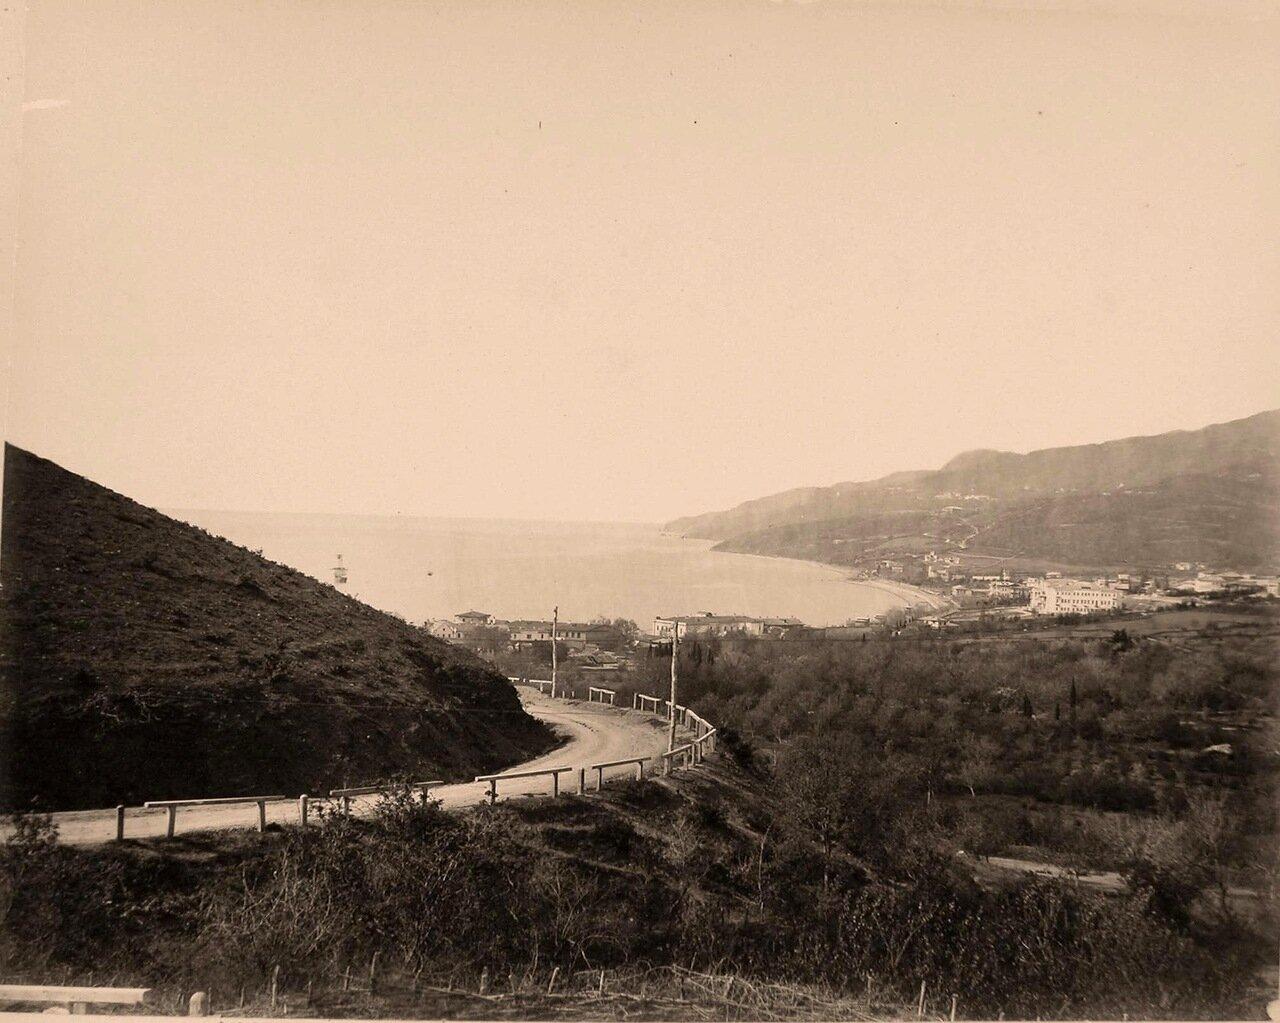 15. Вид домов на побережье; на первом плане - дорога на Поликуровский холм